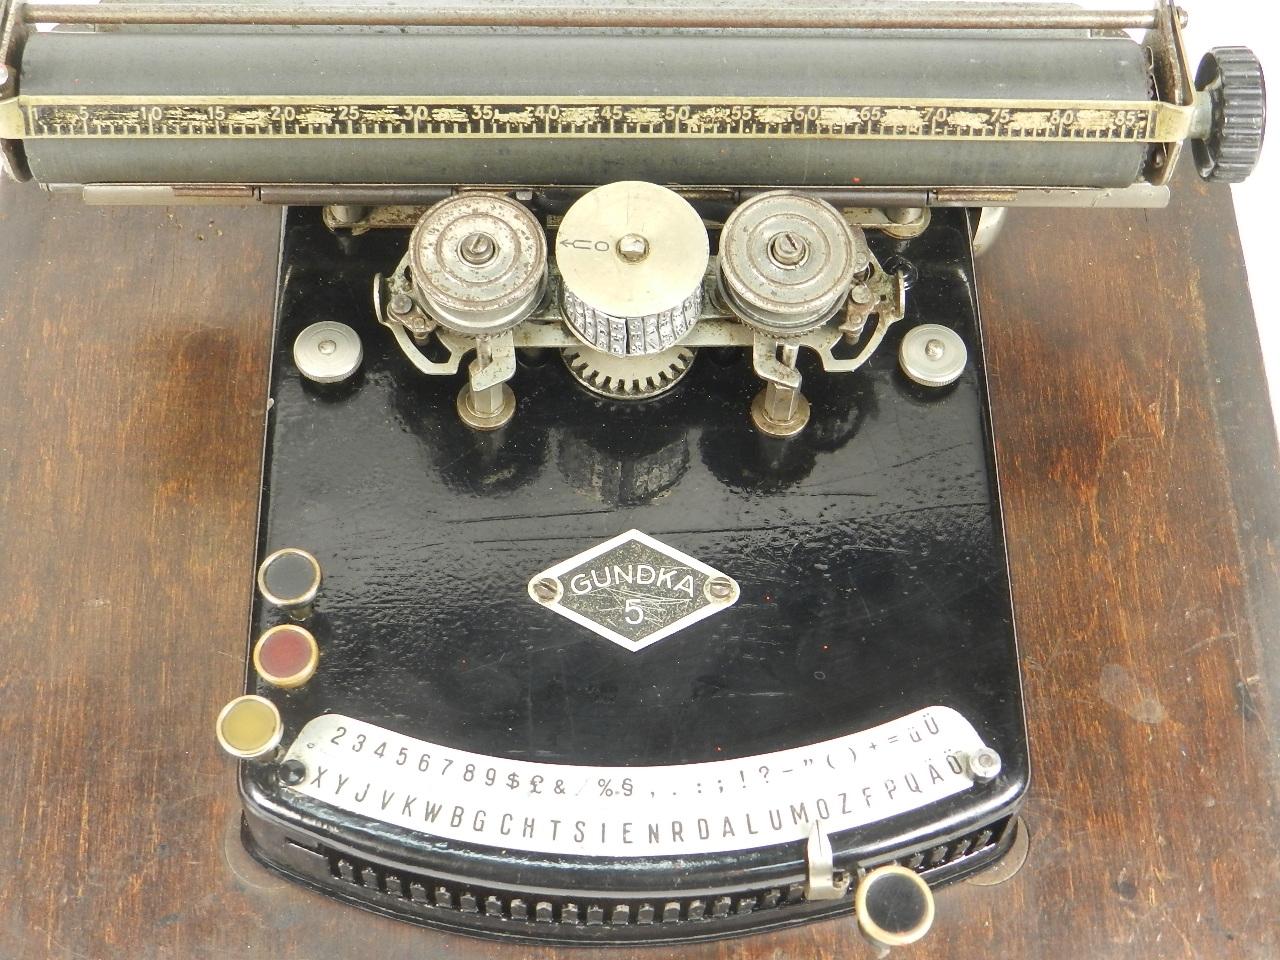 Imagen GUNDKA Nº5 AÑO 1924 28475